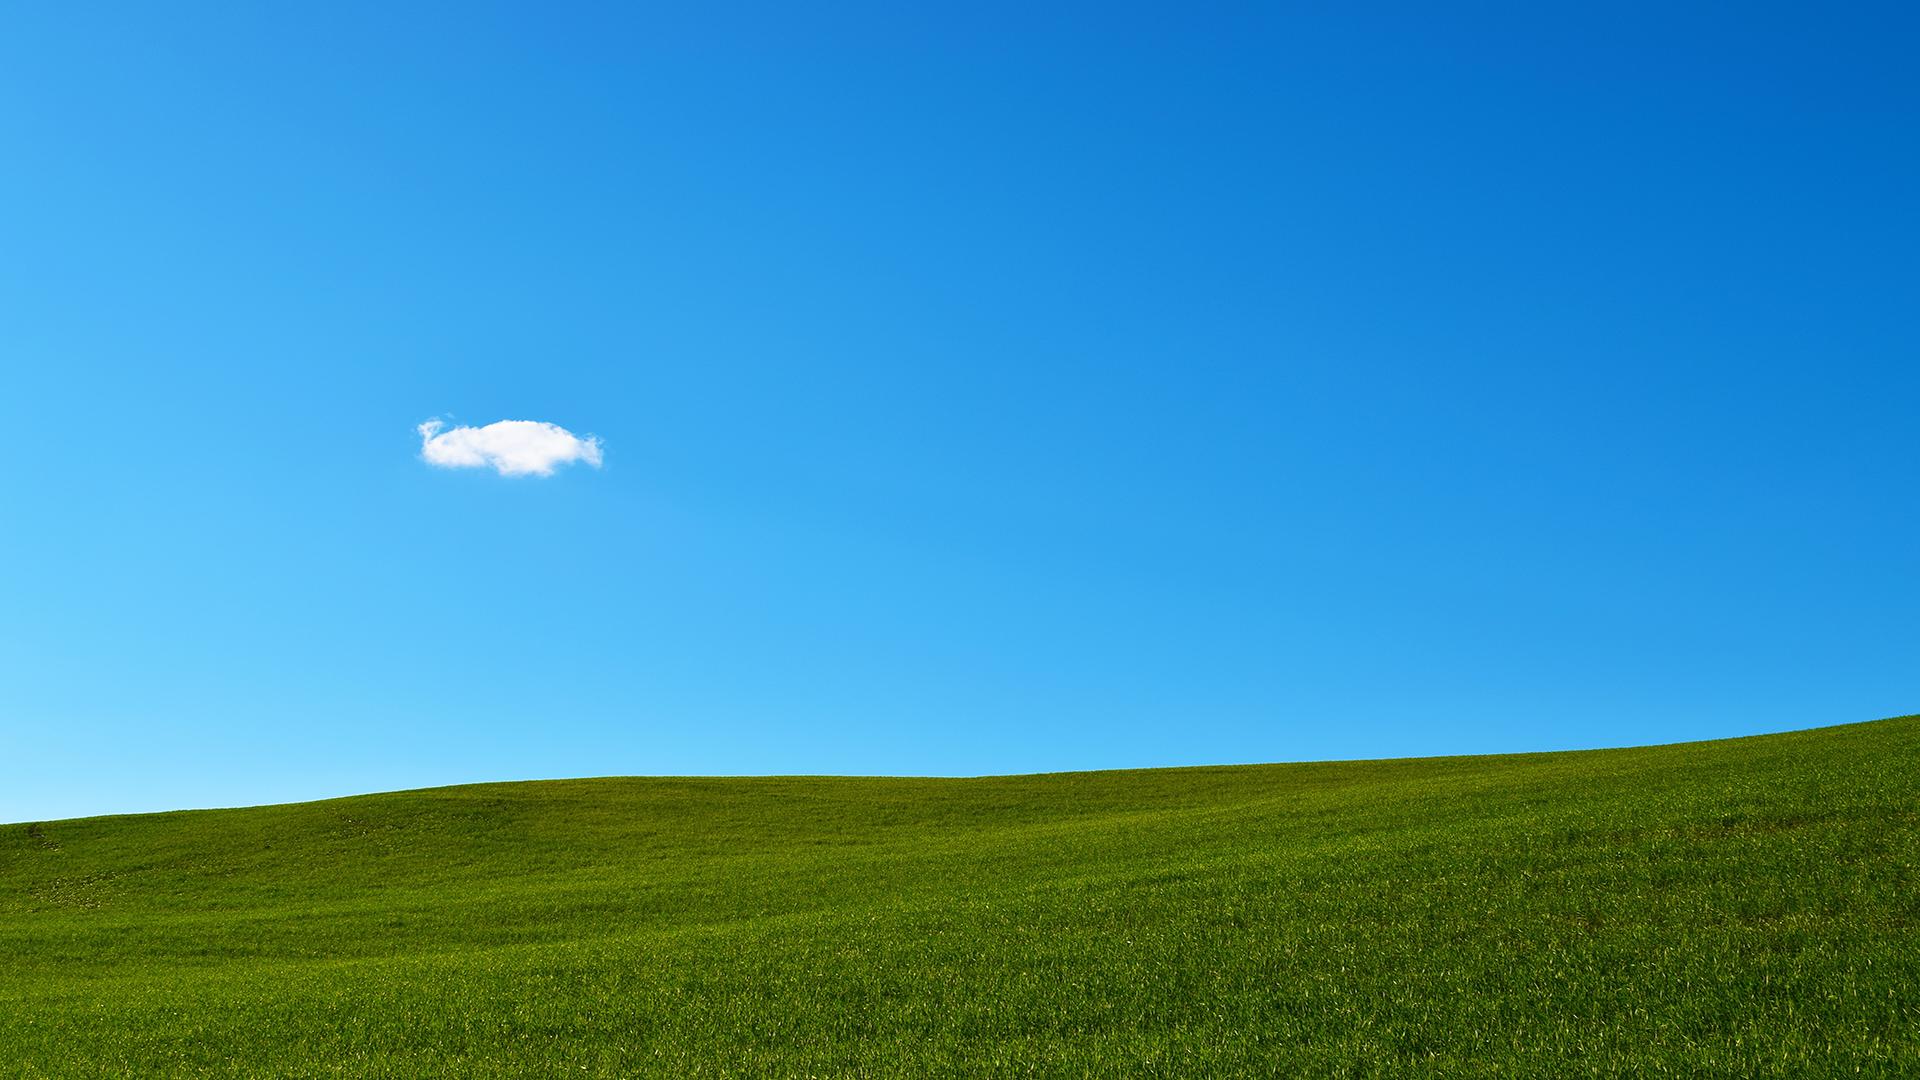 Green Grass And Sky Similar To Windows Xp Wallpaper